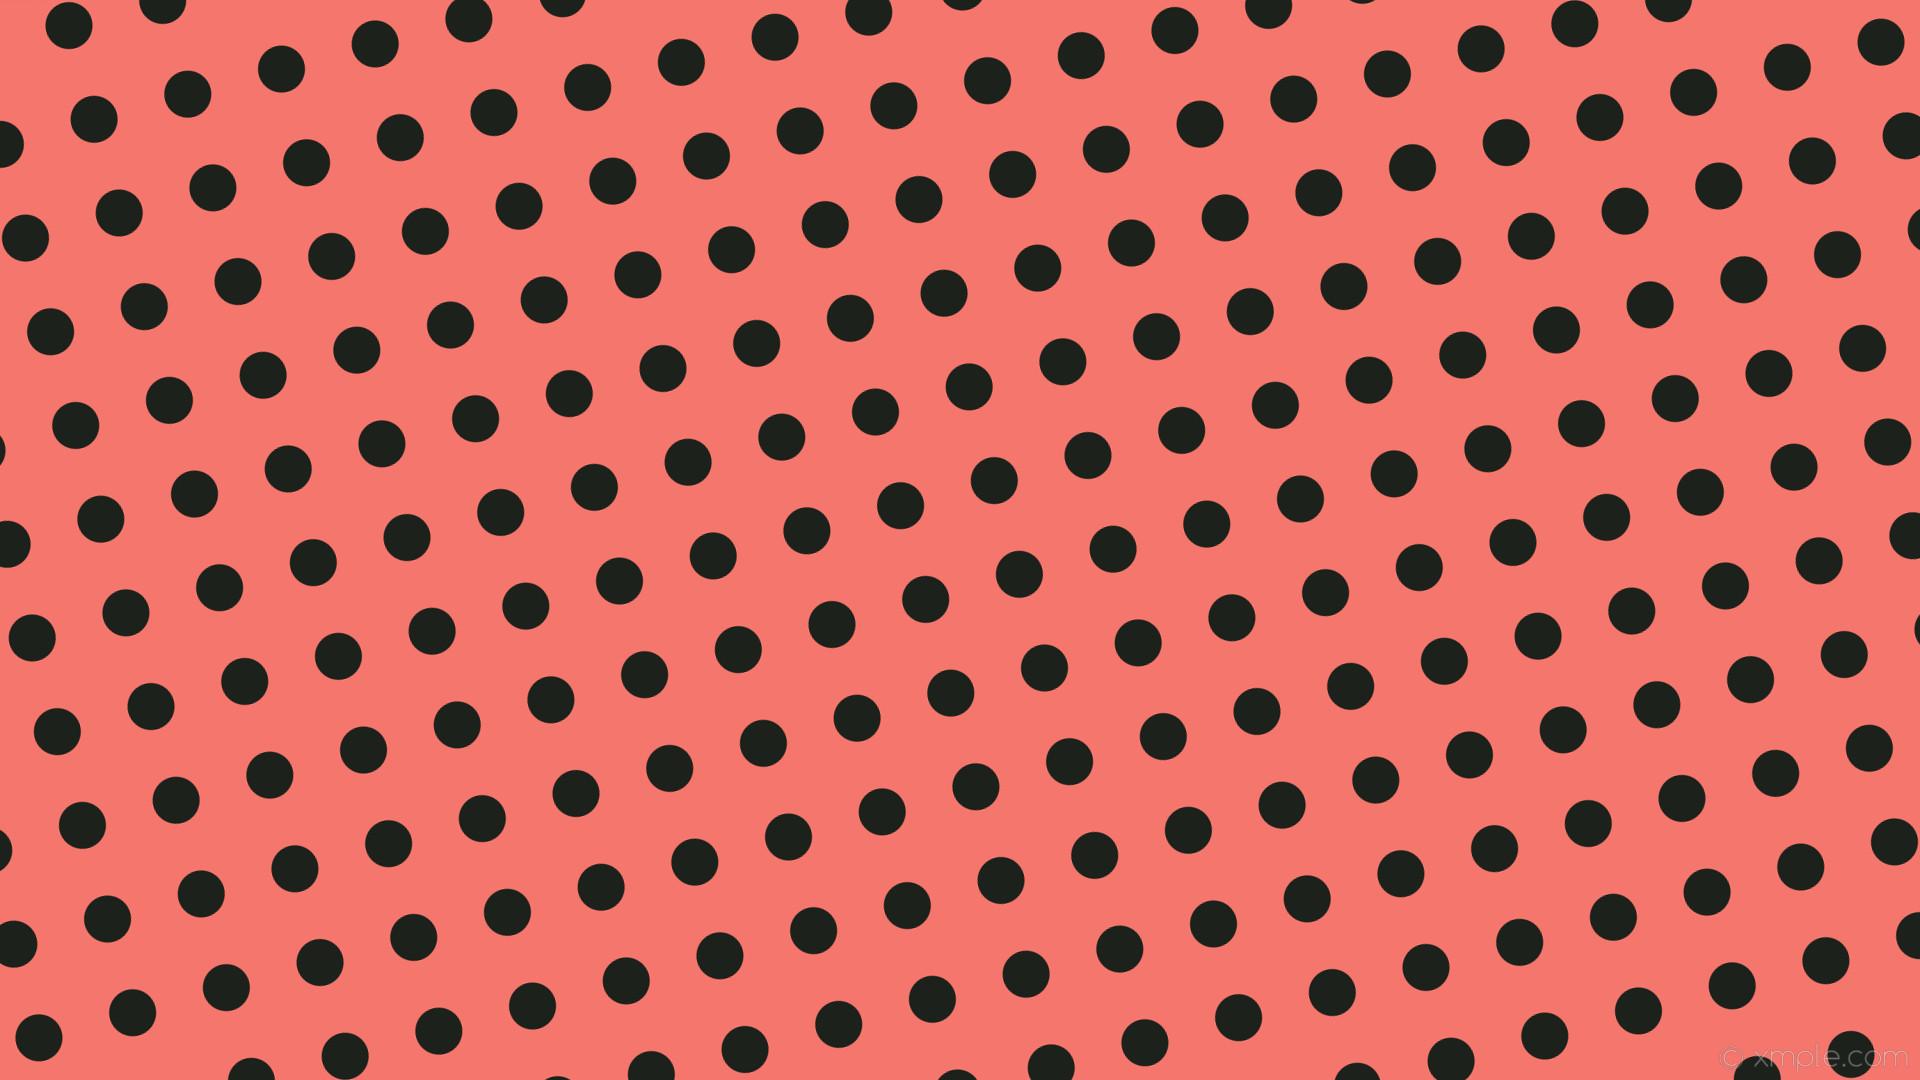 wallpaper spots lime dots red polka dark lime #f4766c #1d211b 105° 47px 97px